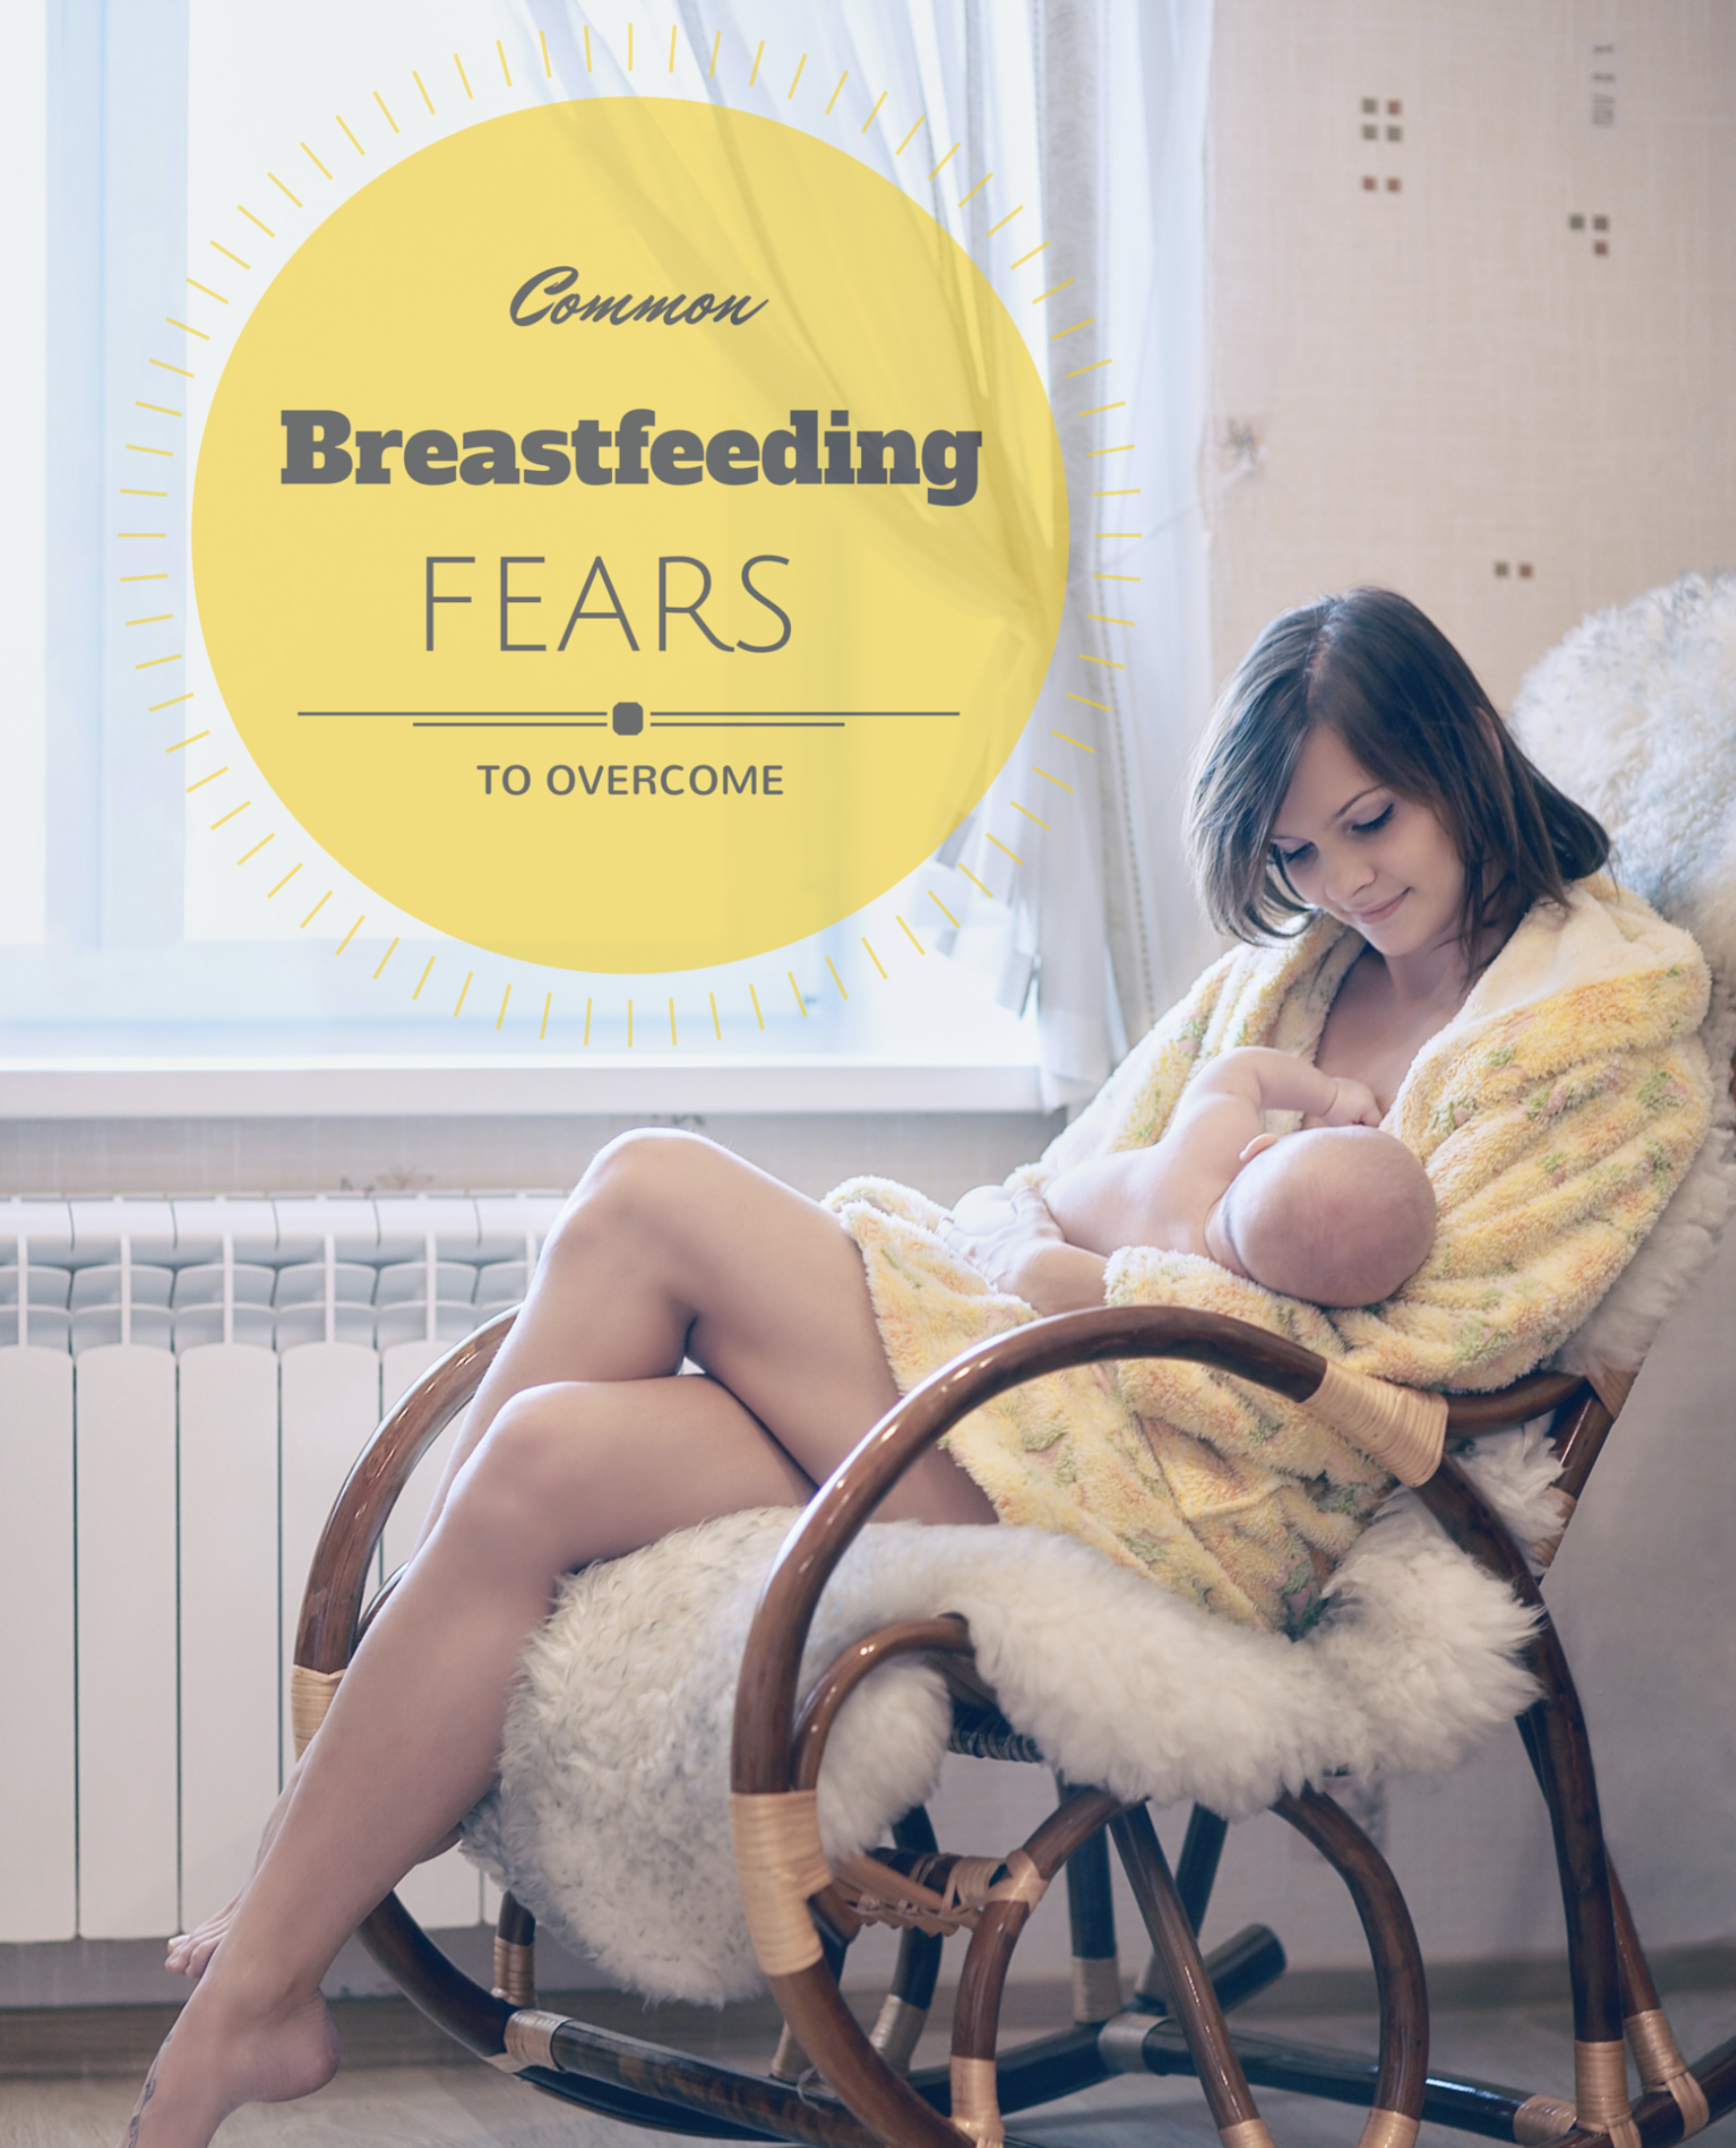 Common Breastfeeding Fears